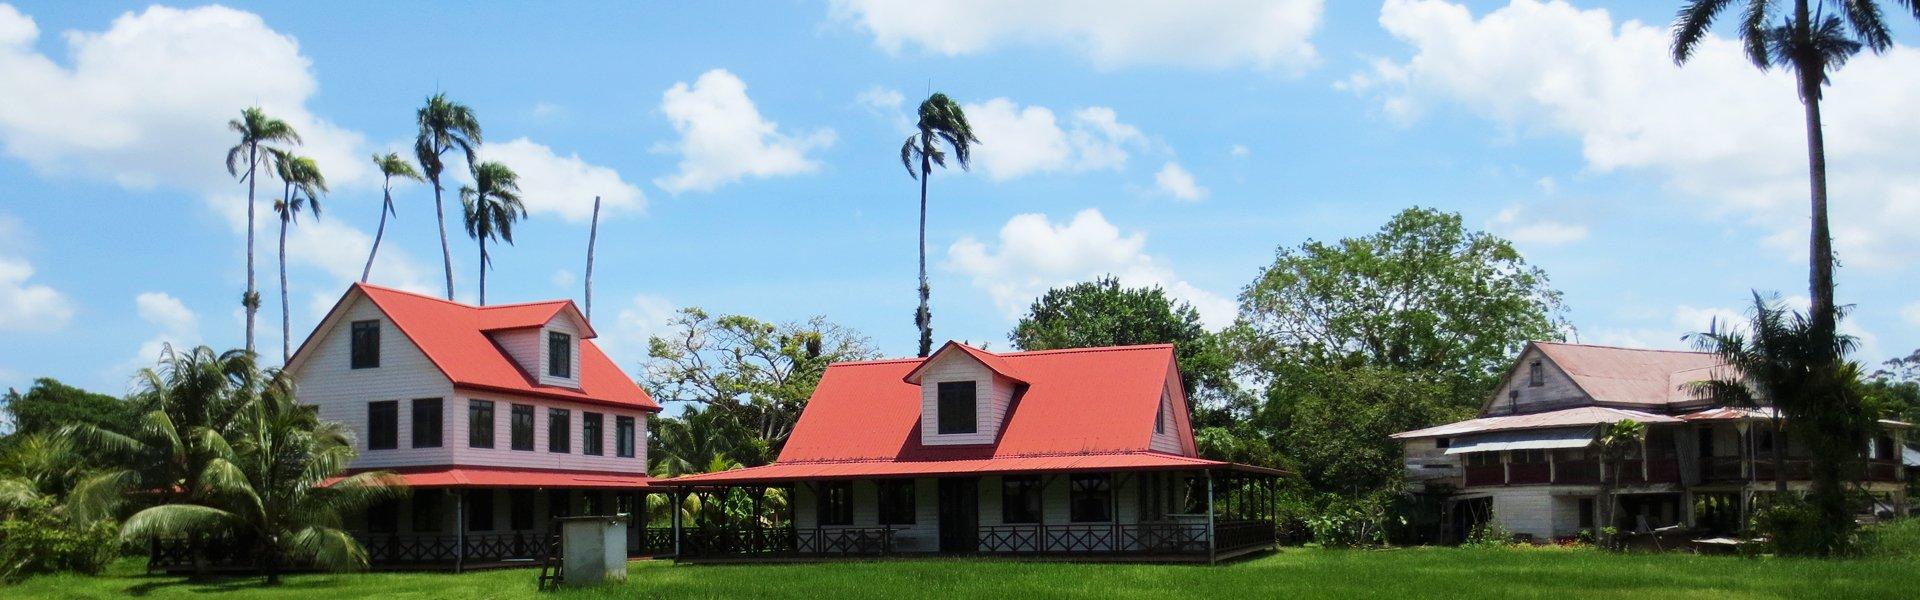 Peperpot plantage Suriname